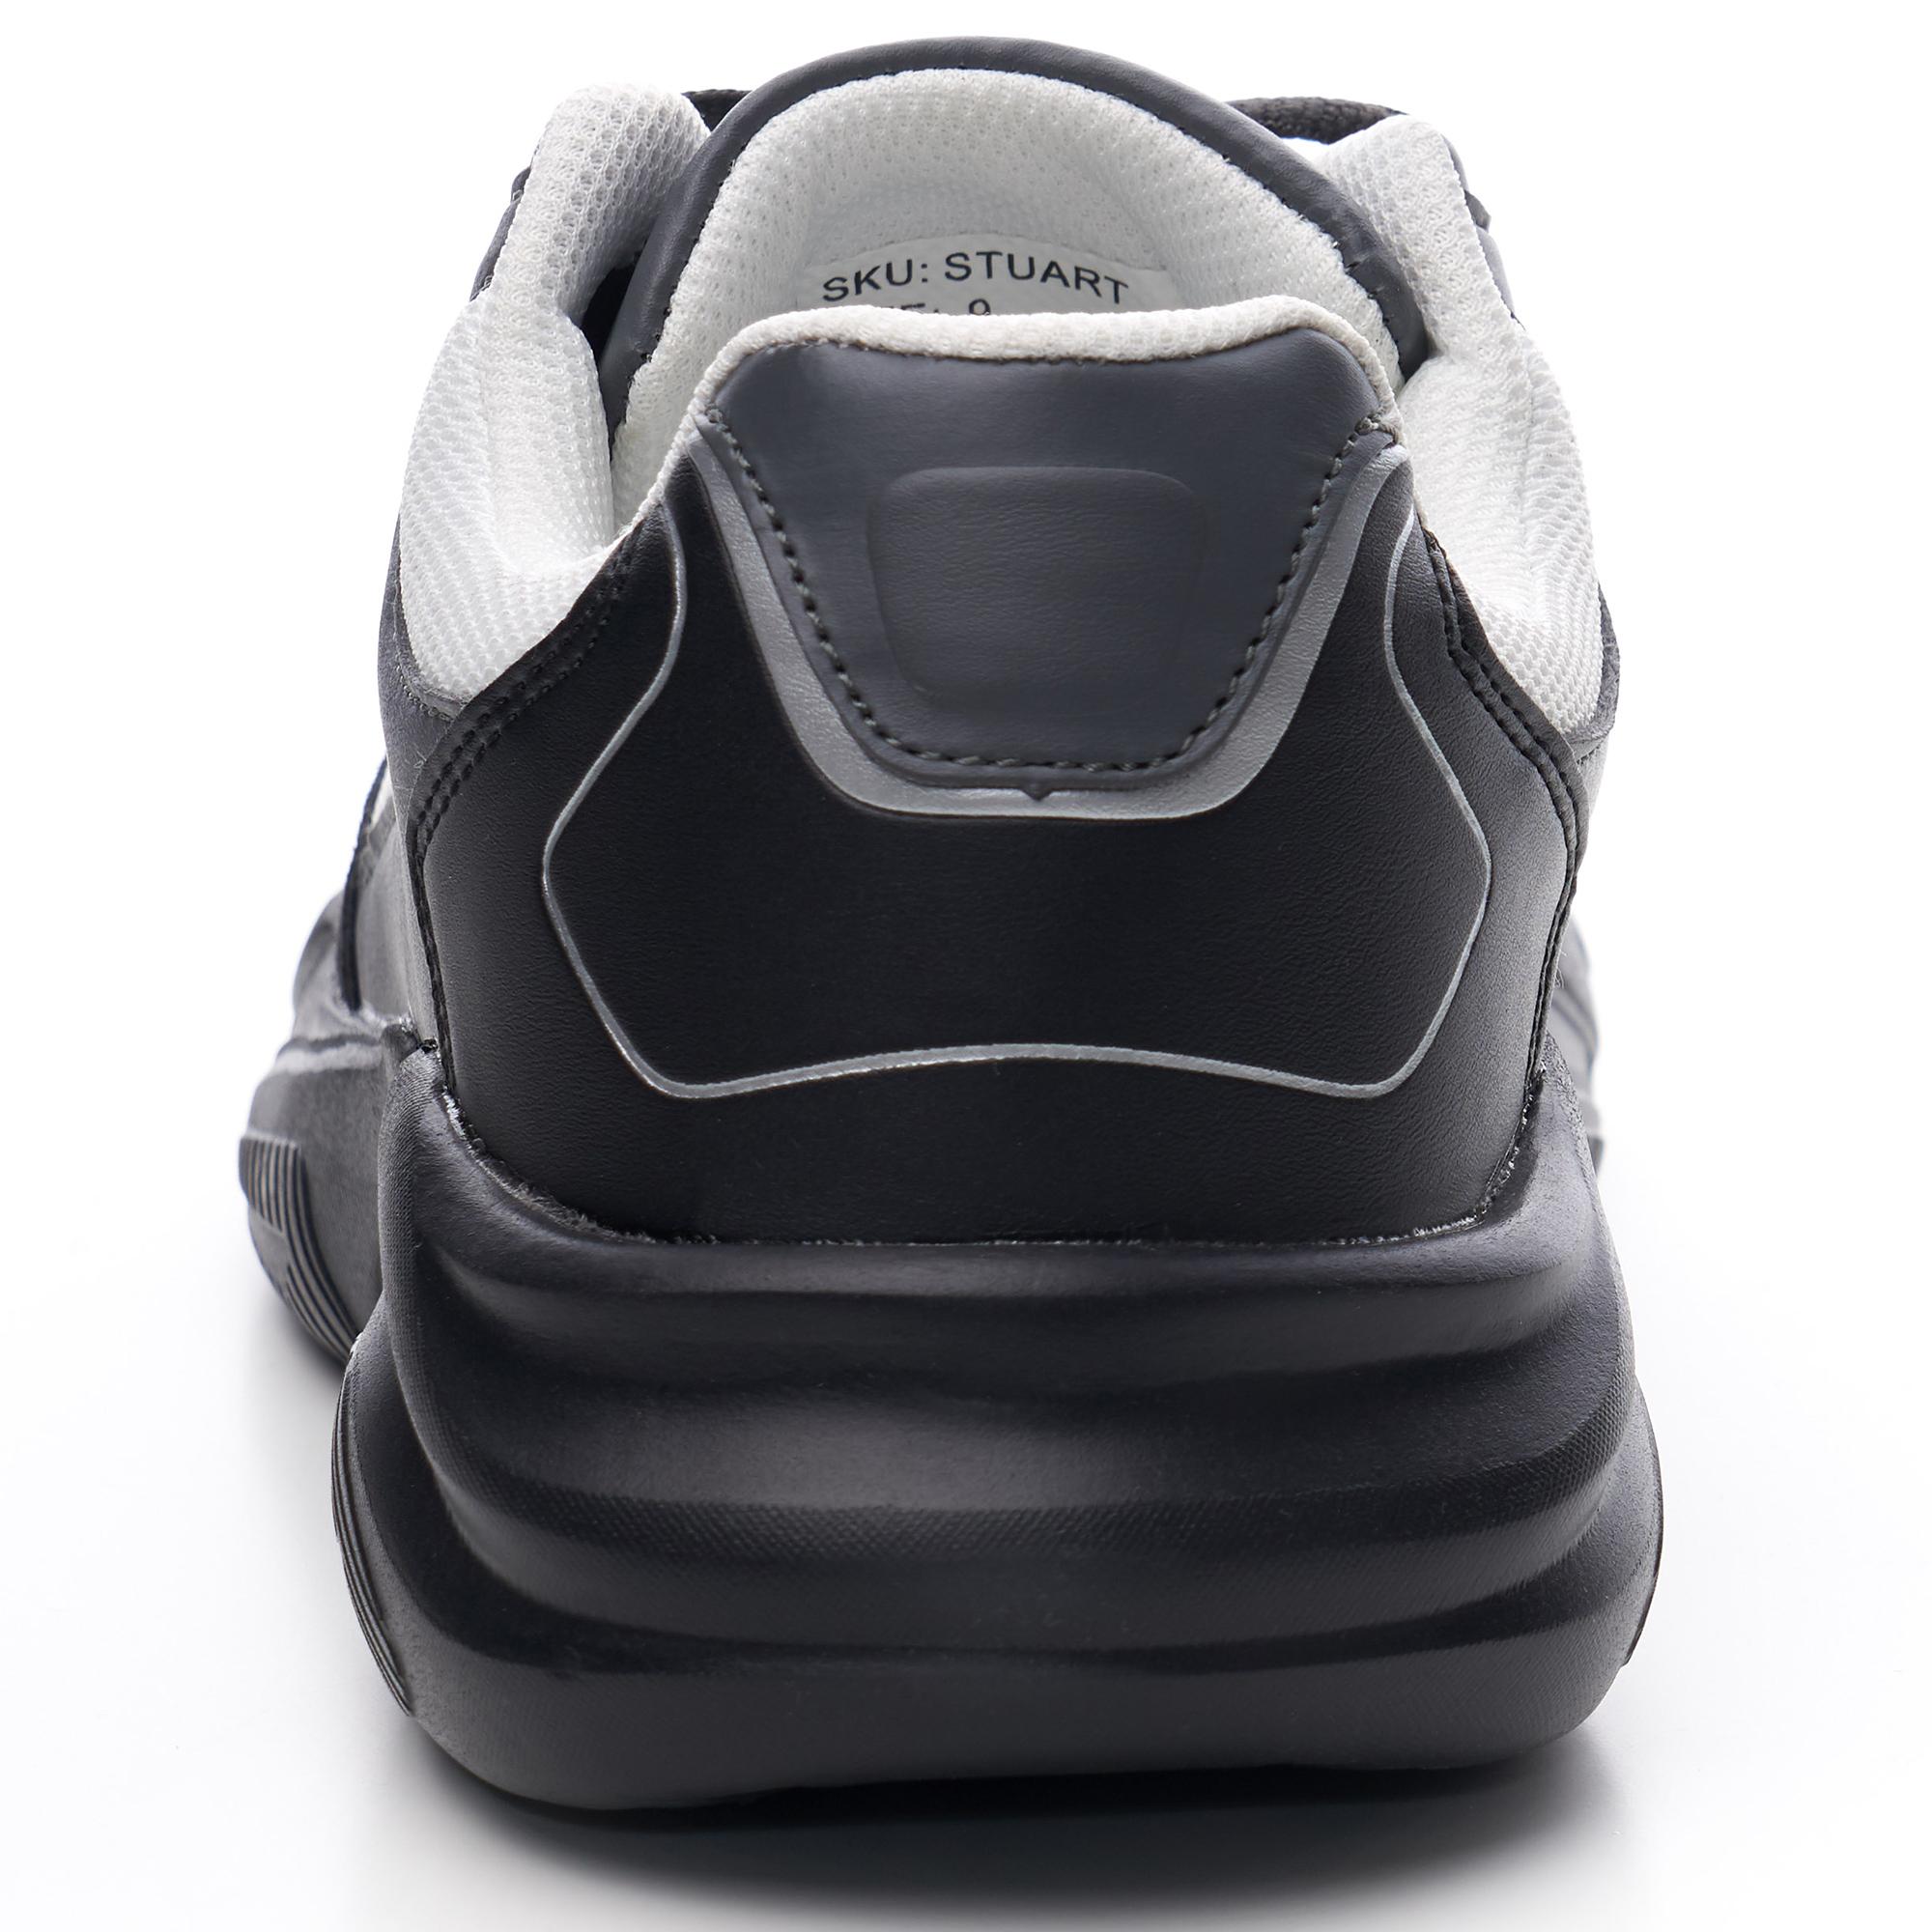 Alpine-Swiss-Stuart-Mens-Chunky-Sneakers-Retro-Platform-Dad-Tennis-Shoes thumbnail 23